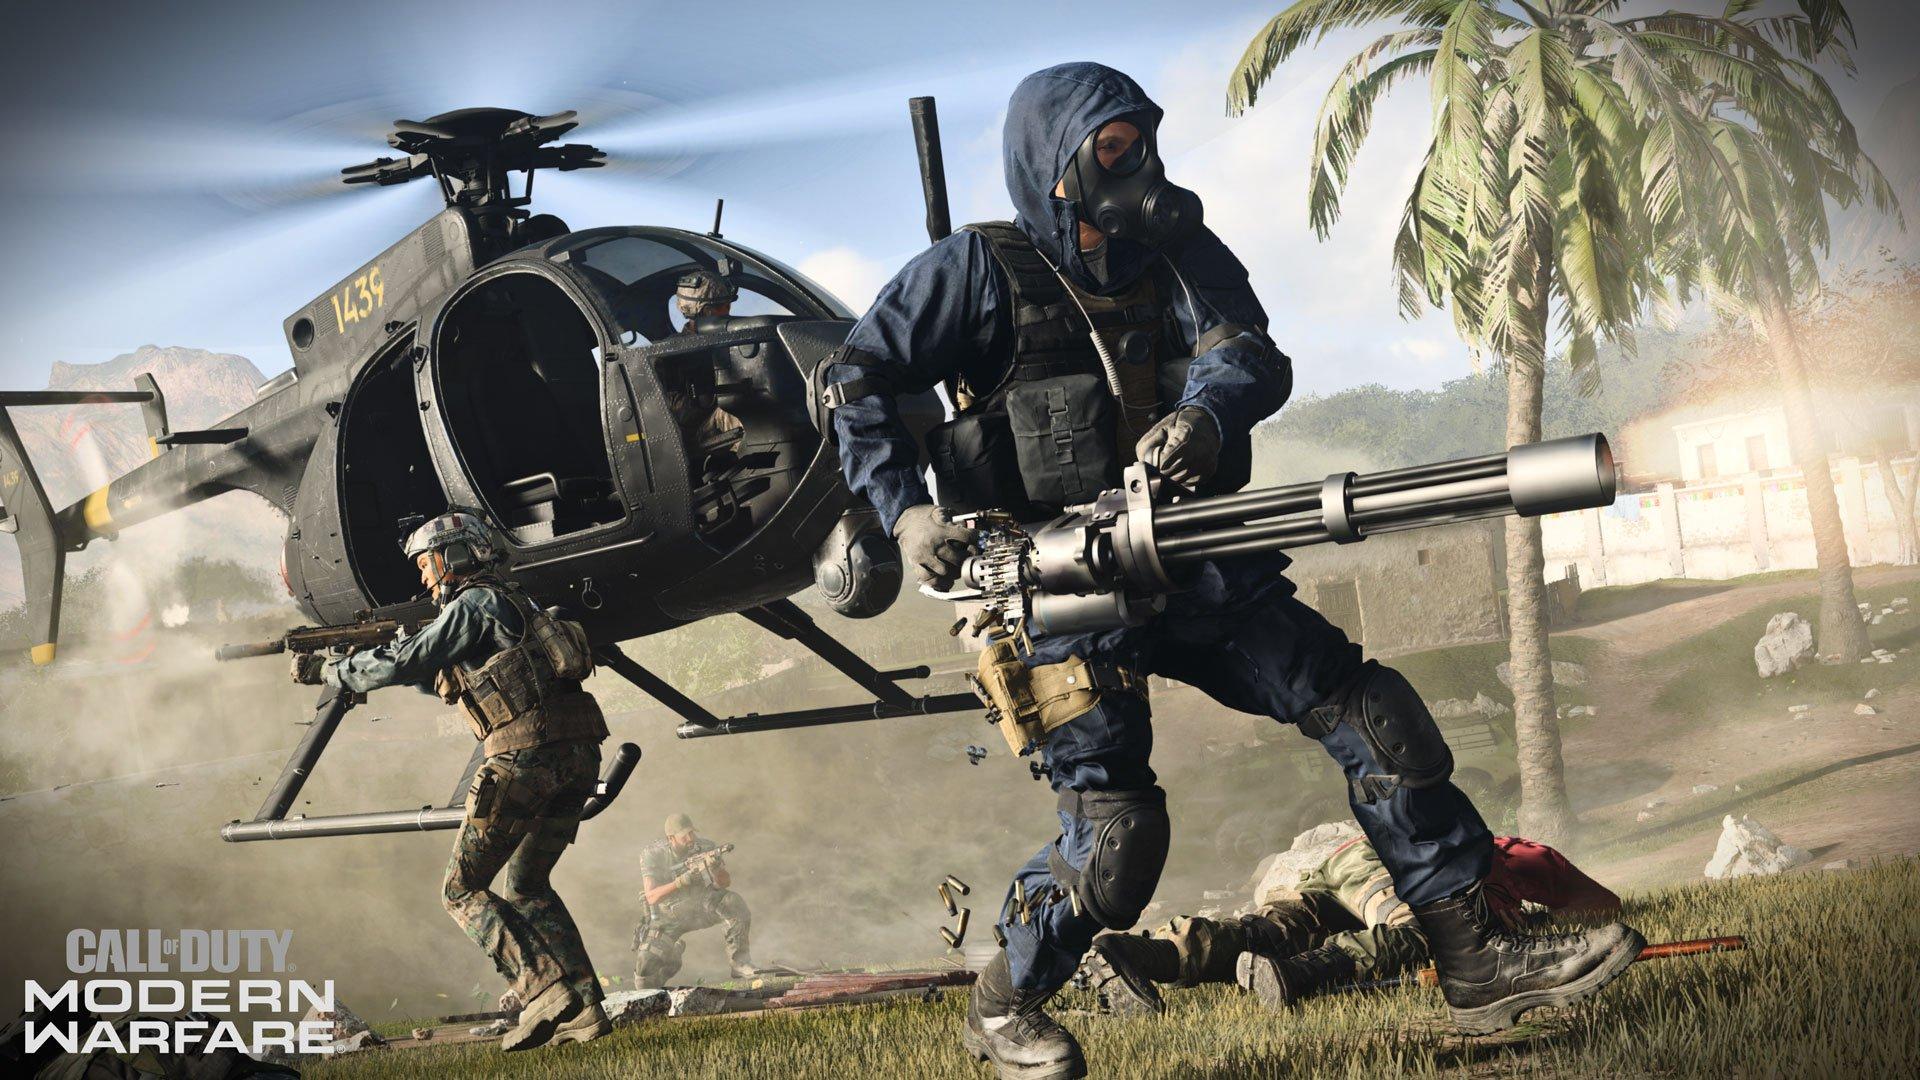 Infinity Ward working on a fix for Modern Warfare stat reset bug